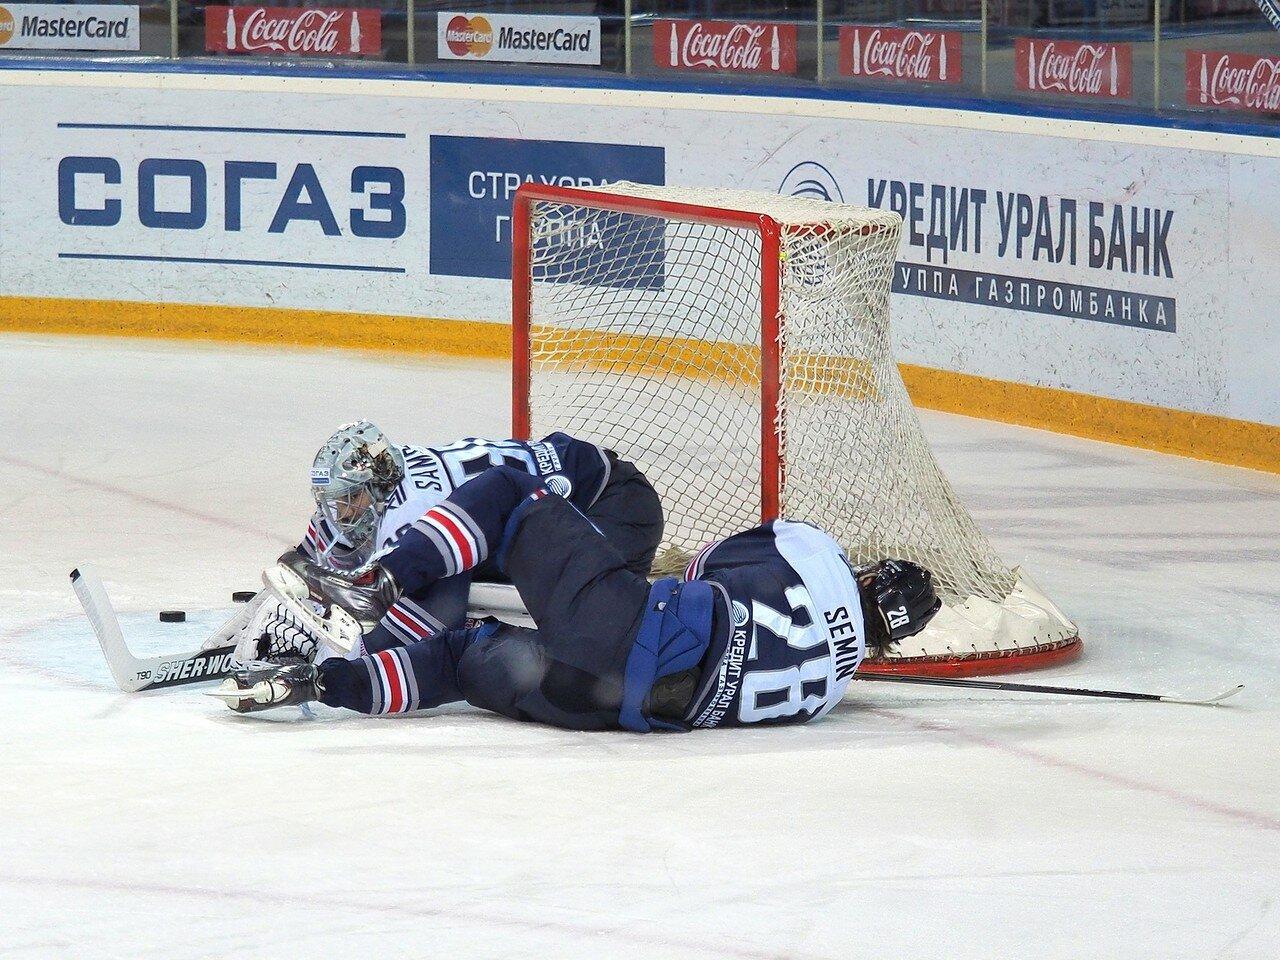 44Плей-офф 2016 Восток 1/2 Металлург - Сибирь 10.03.2016